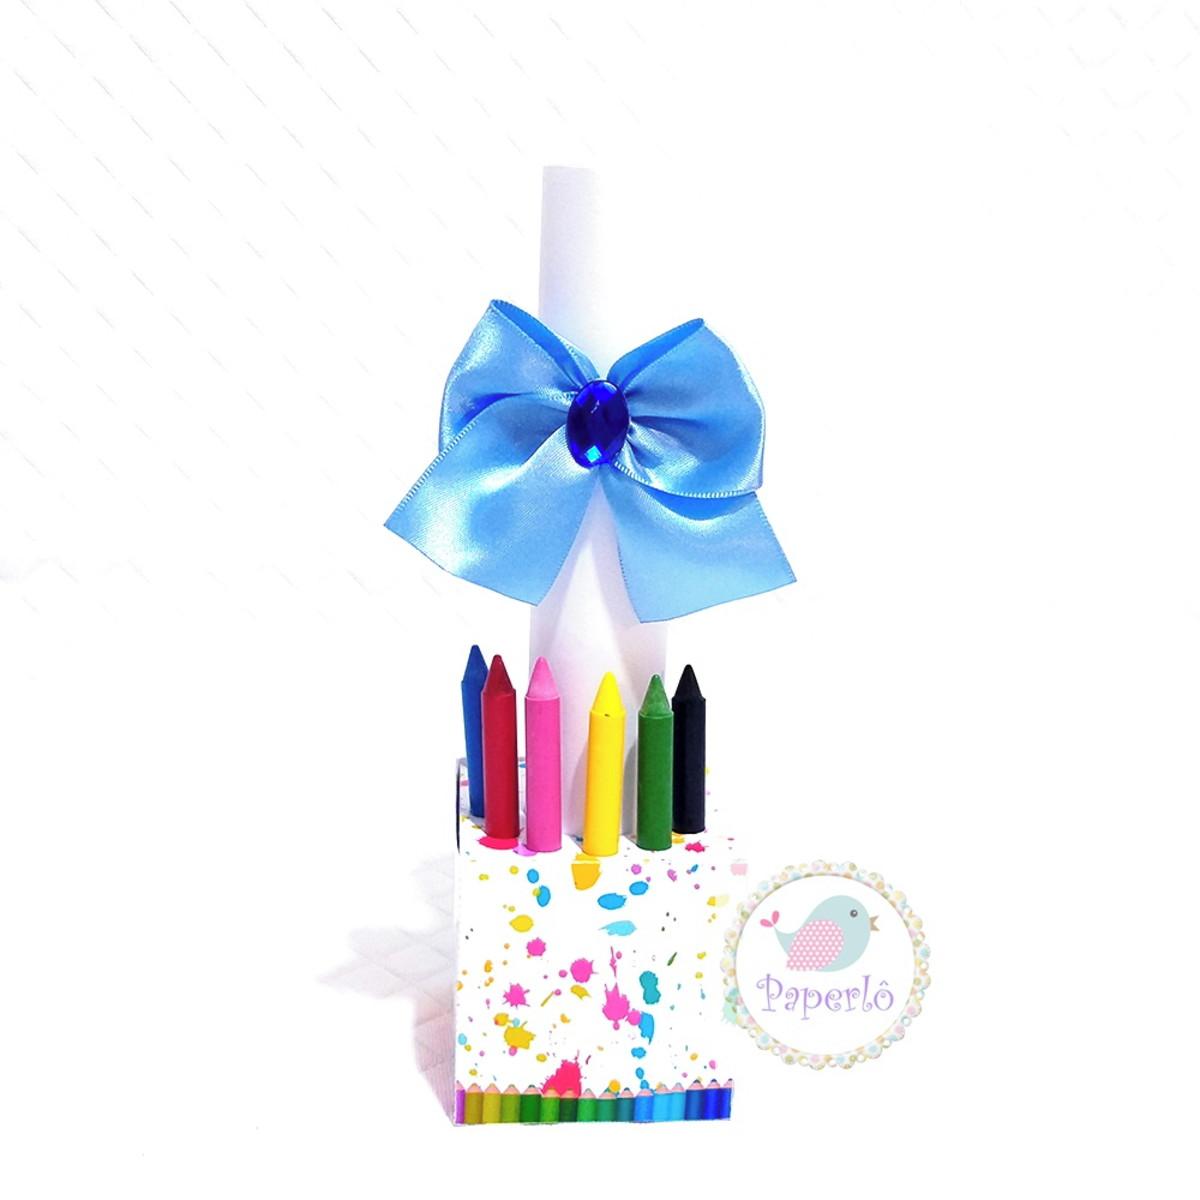 Kit Colorir Pintando O Sete No Elo7 Paperlo Personalizados 104d2f3